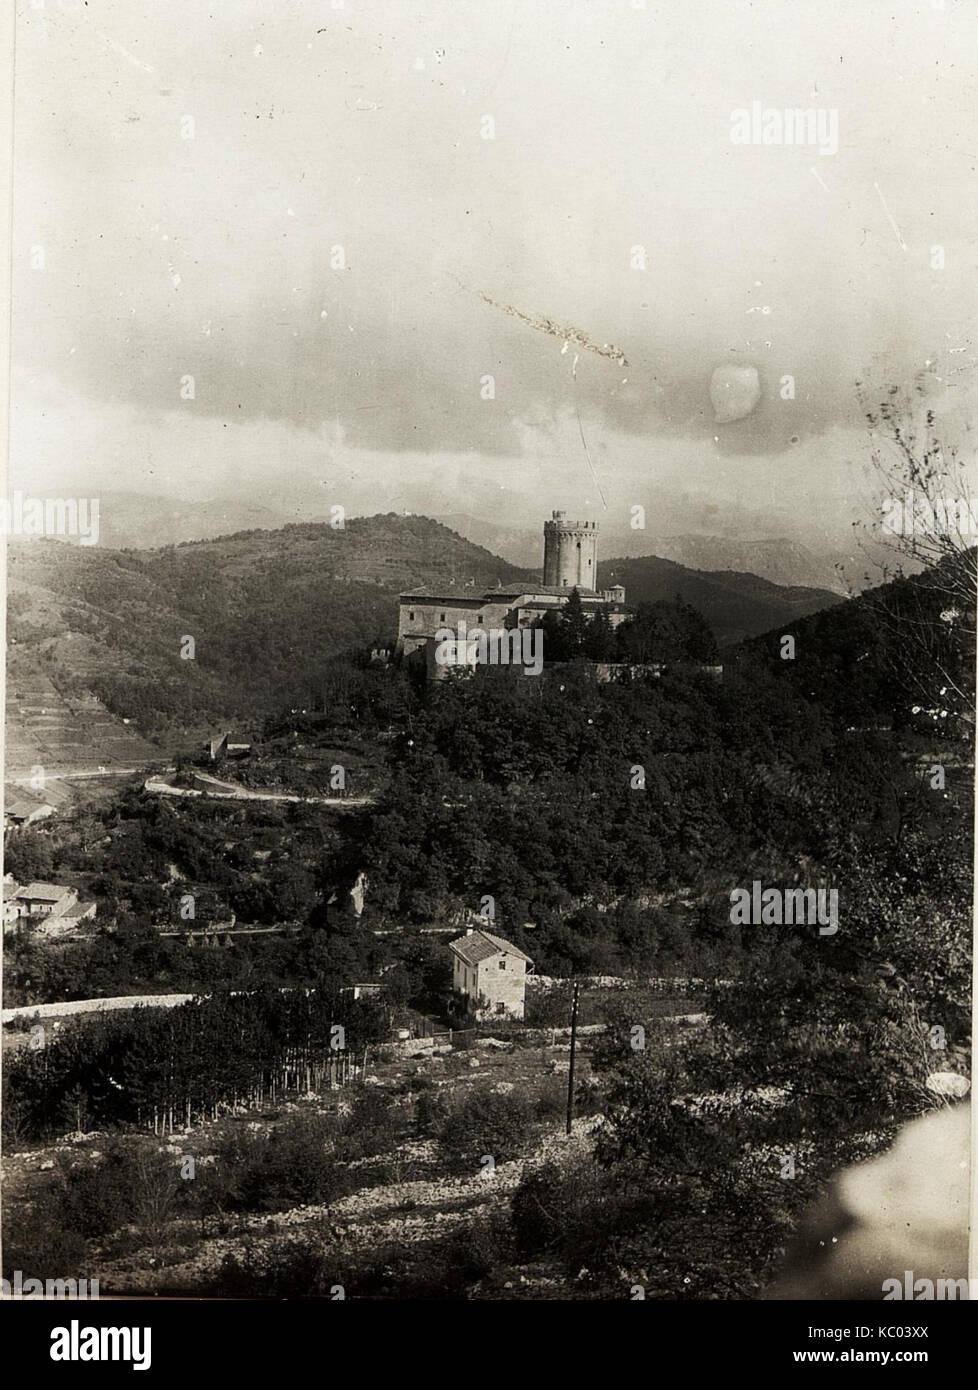 Schloss Reifenberg, Oktober 1915. (BildID 15594453) Stock Photo